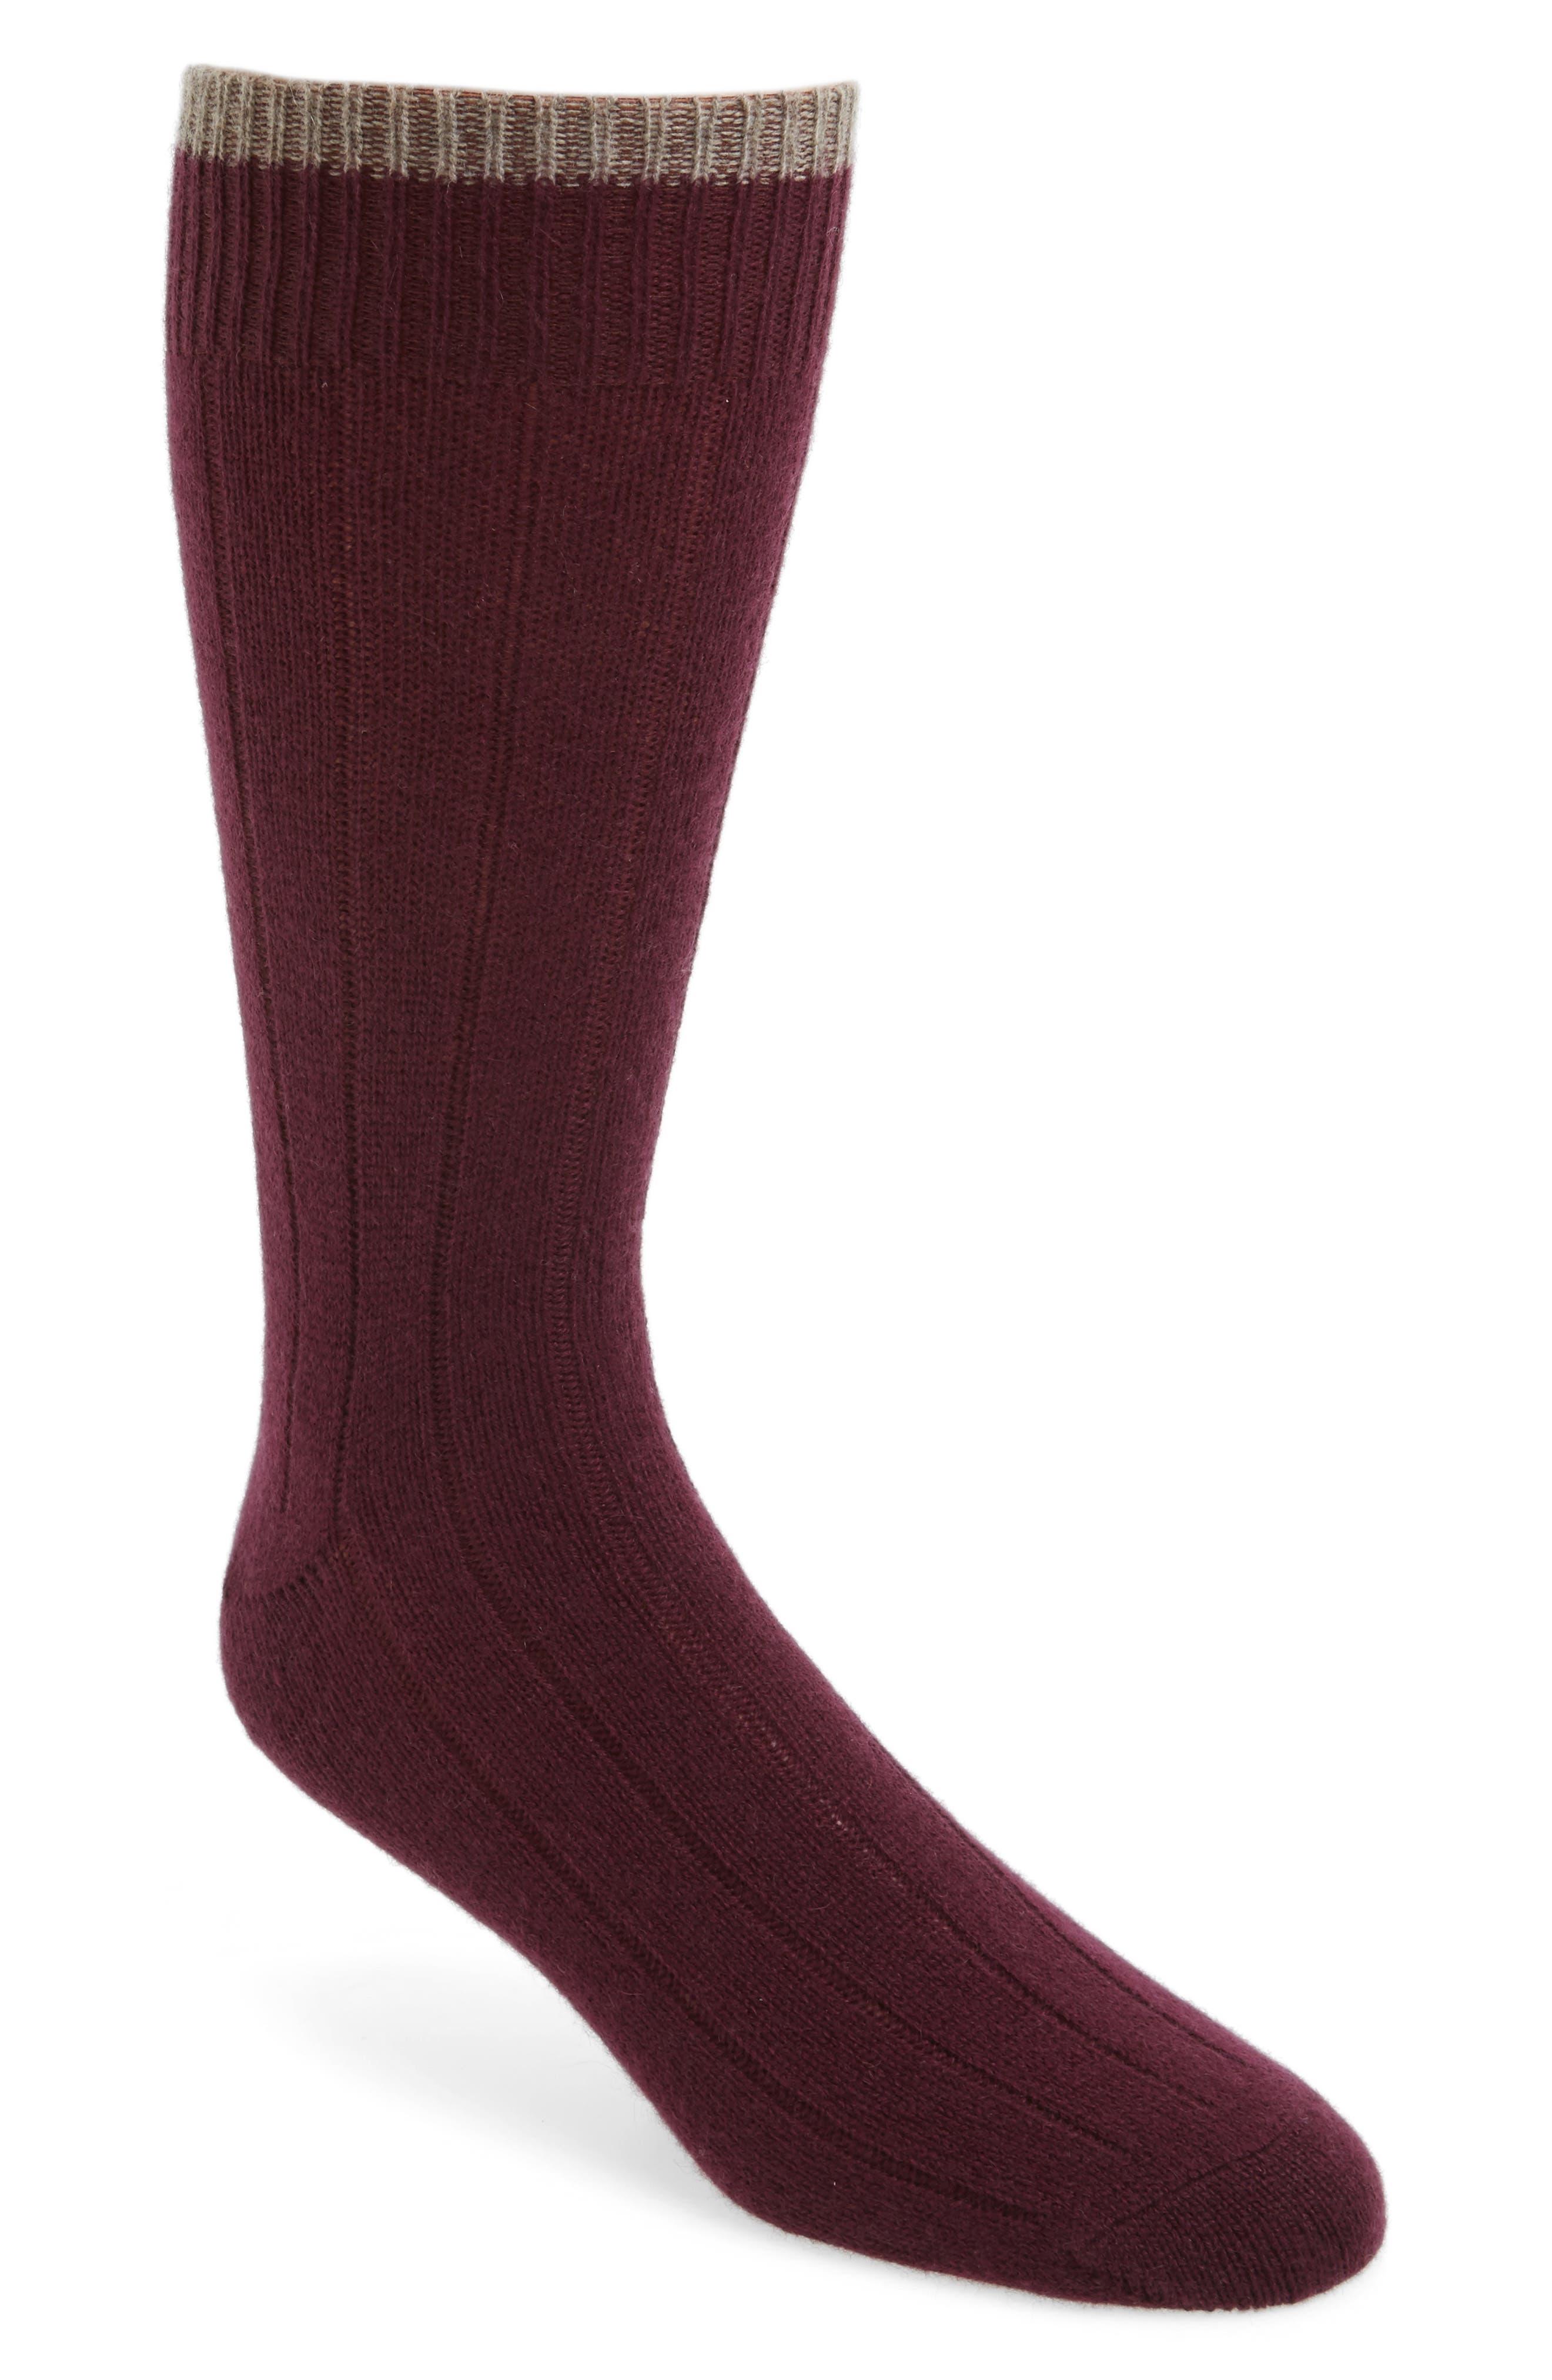 Main Image - John W. Nordstrom® Cashmere Blend Socks